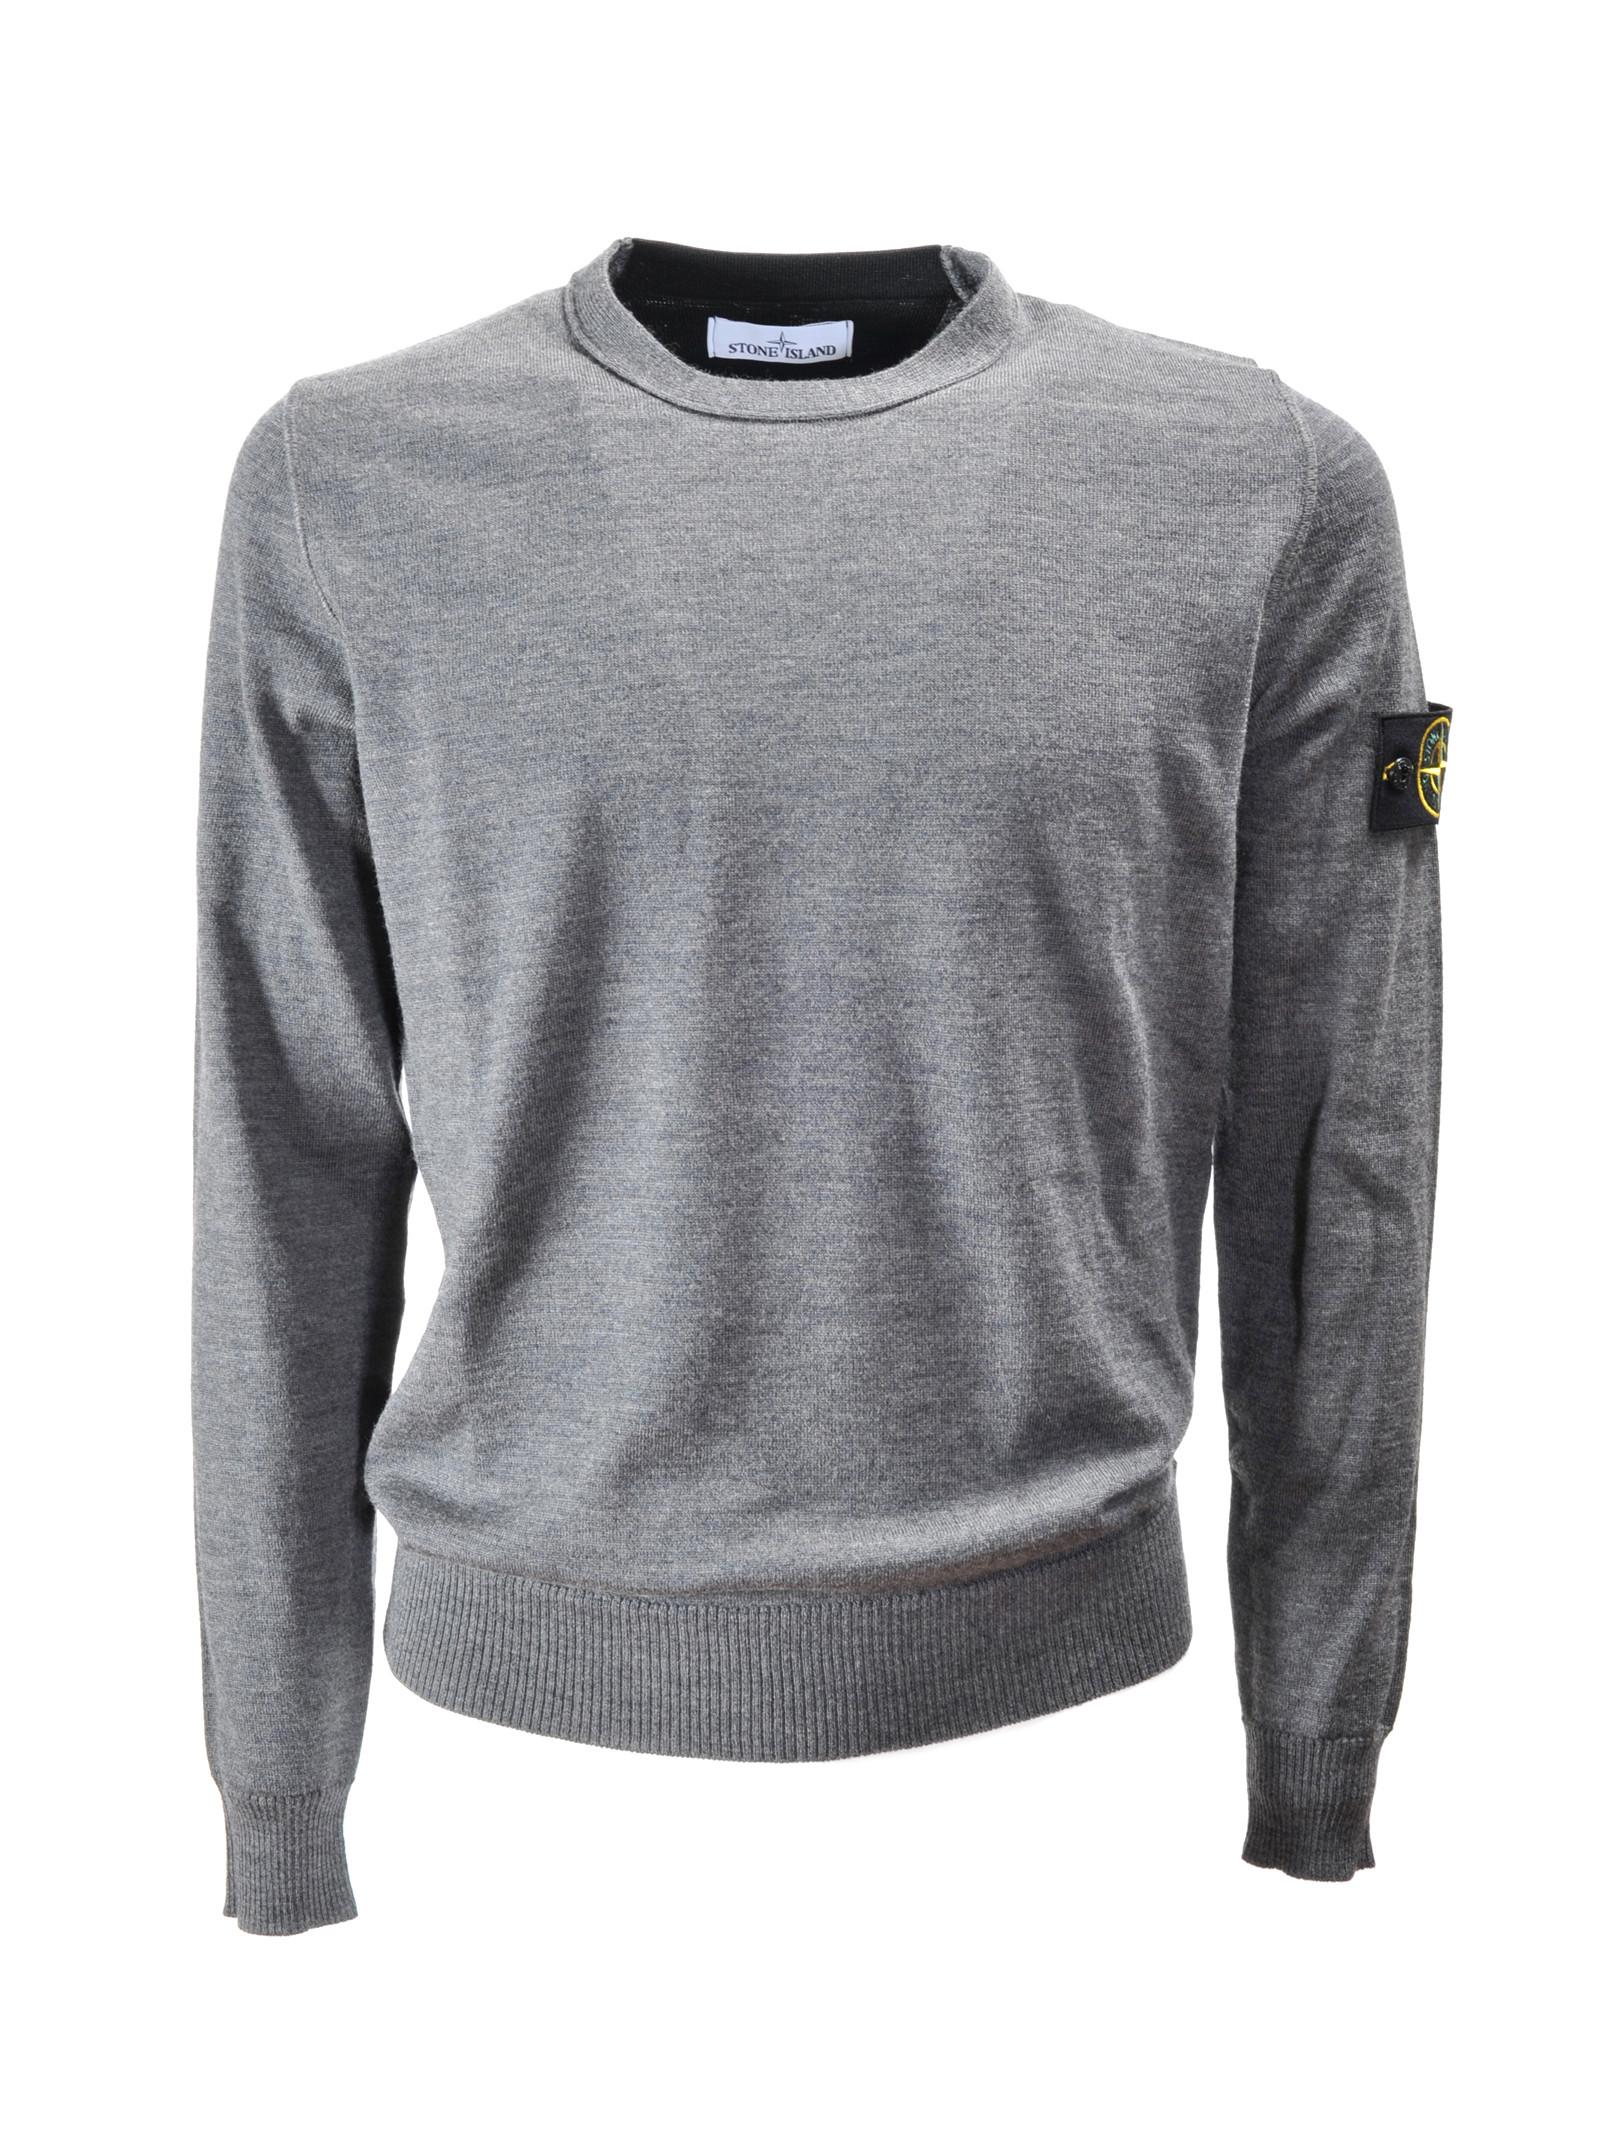 stone island stone island crew neck sweater 651550bc4 v0067 men 39 s sweaters italist. Black Bedroom Furniture Sets. Home Design Ideas